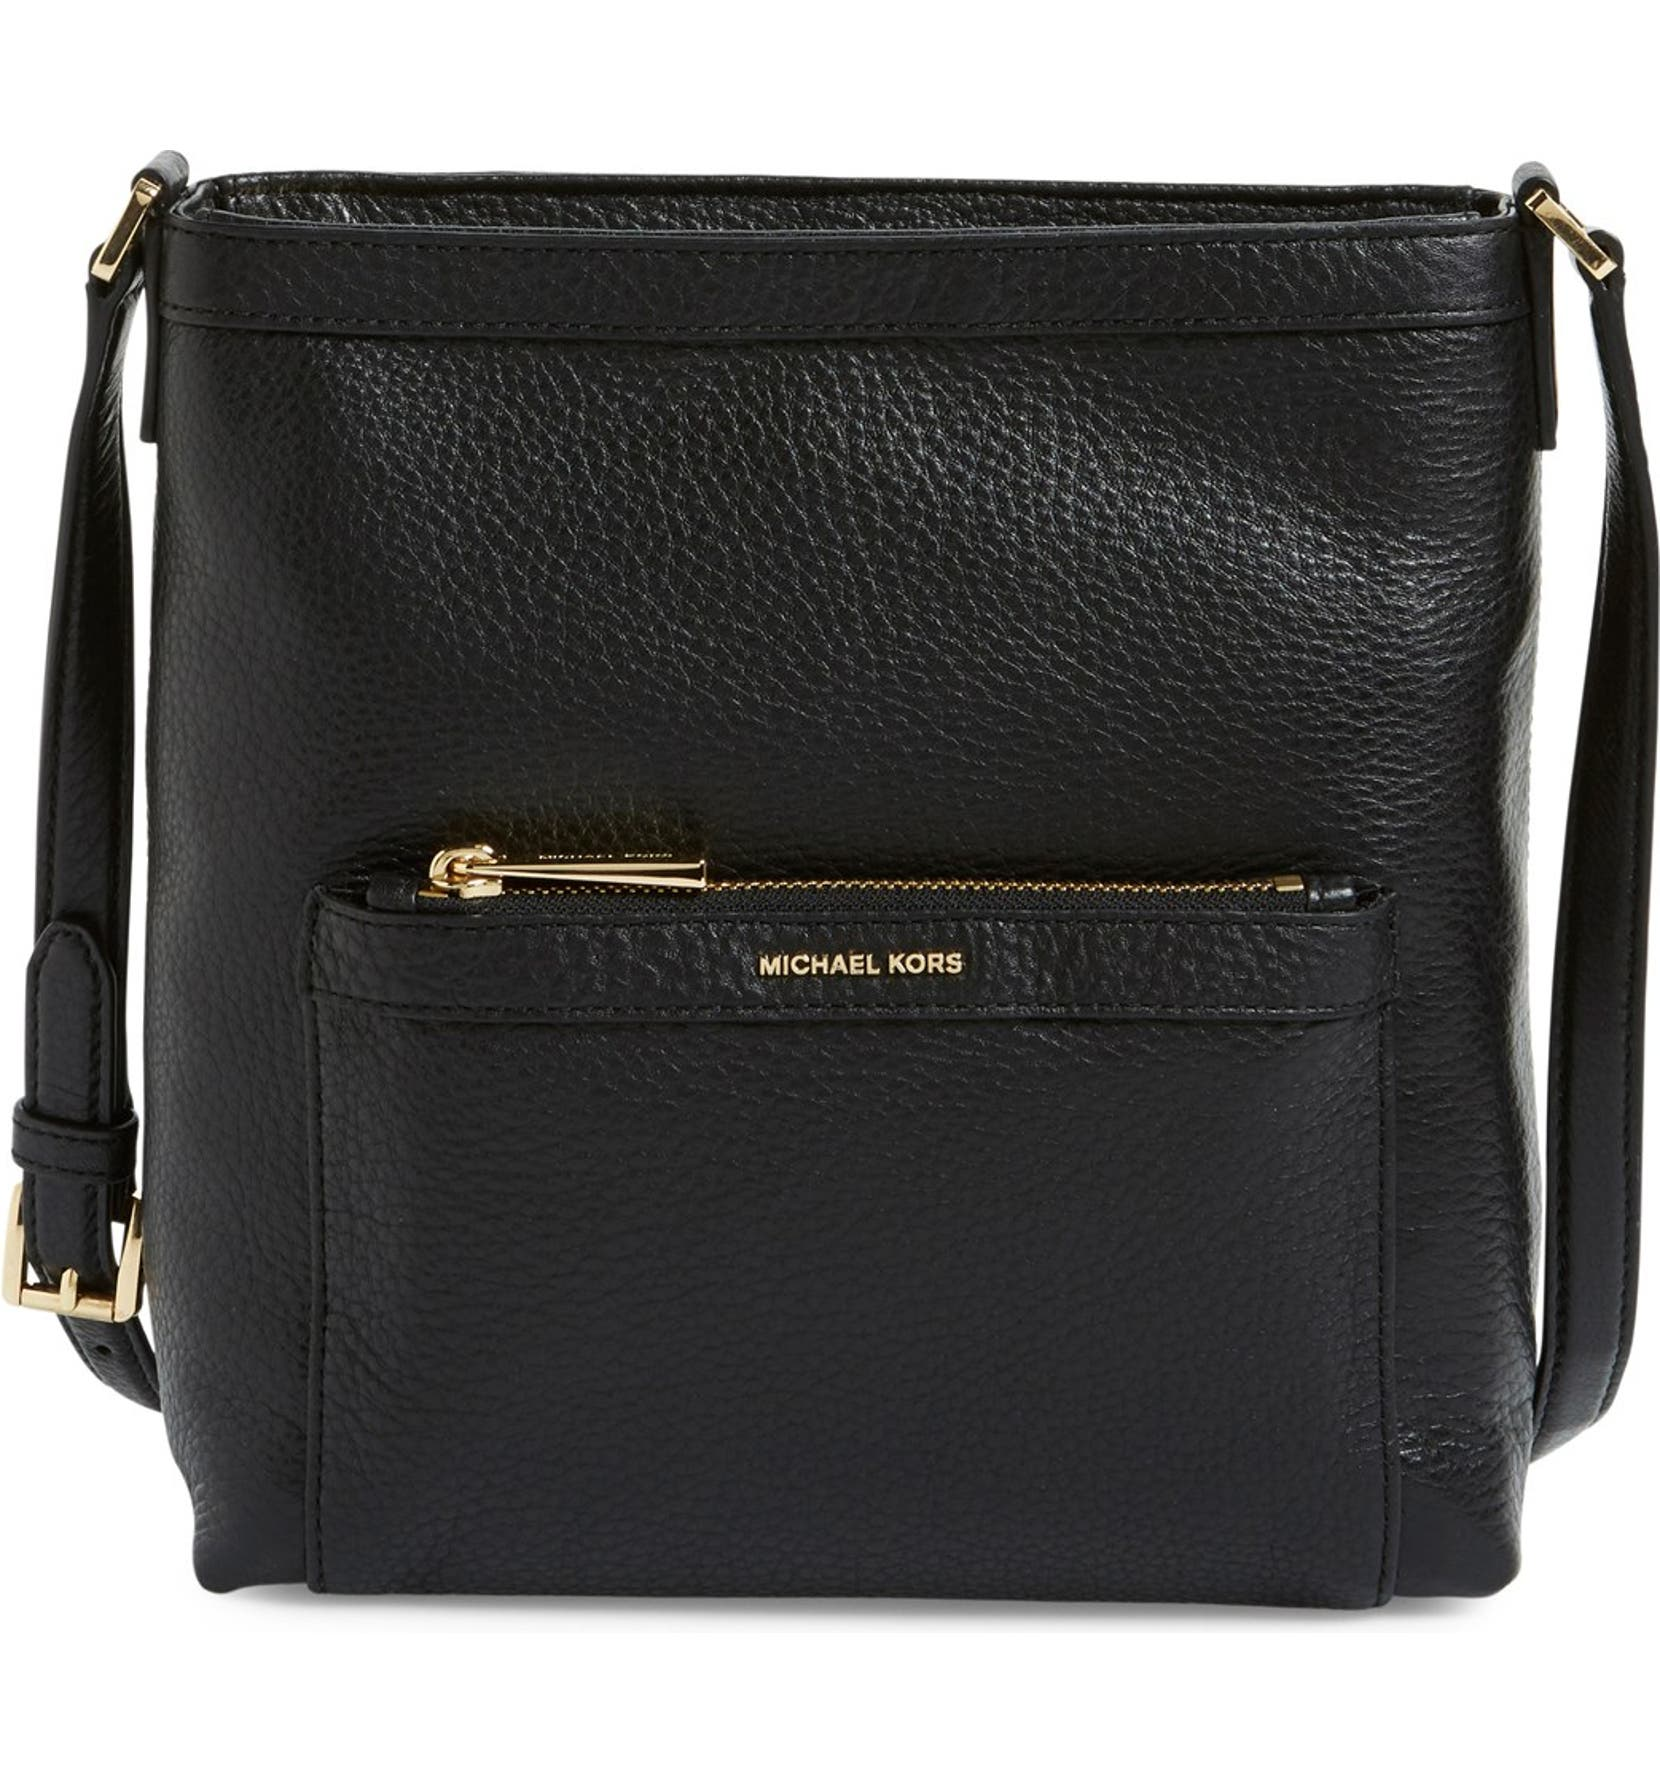 919b8128f049 MICHAEL Michael Kors 'Morgan' Leather Messenger Bag | Nordstrom